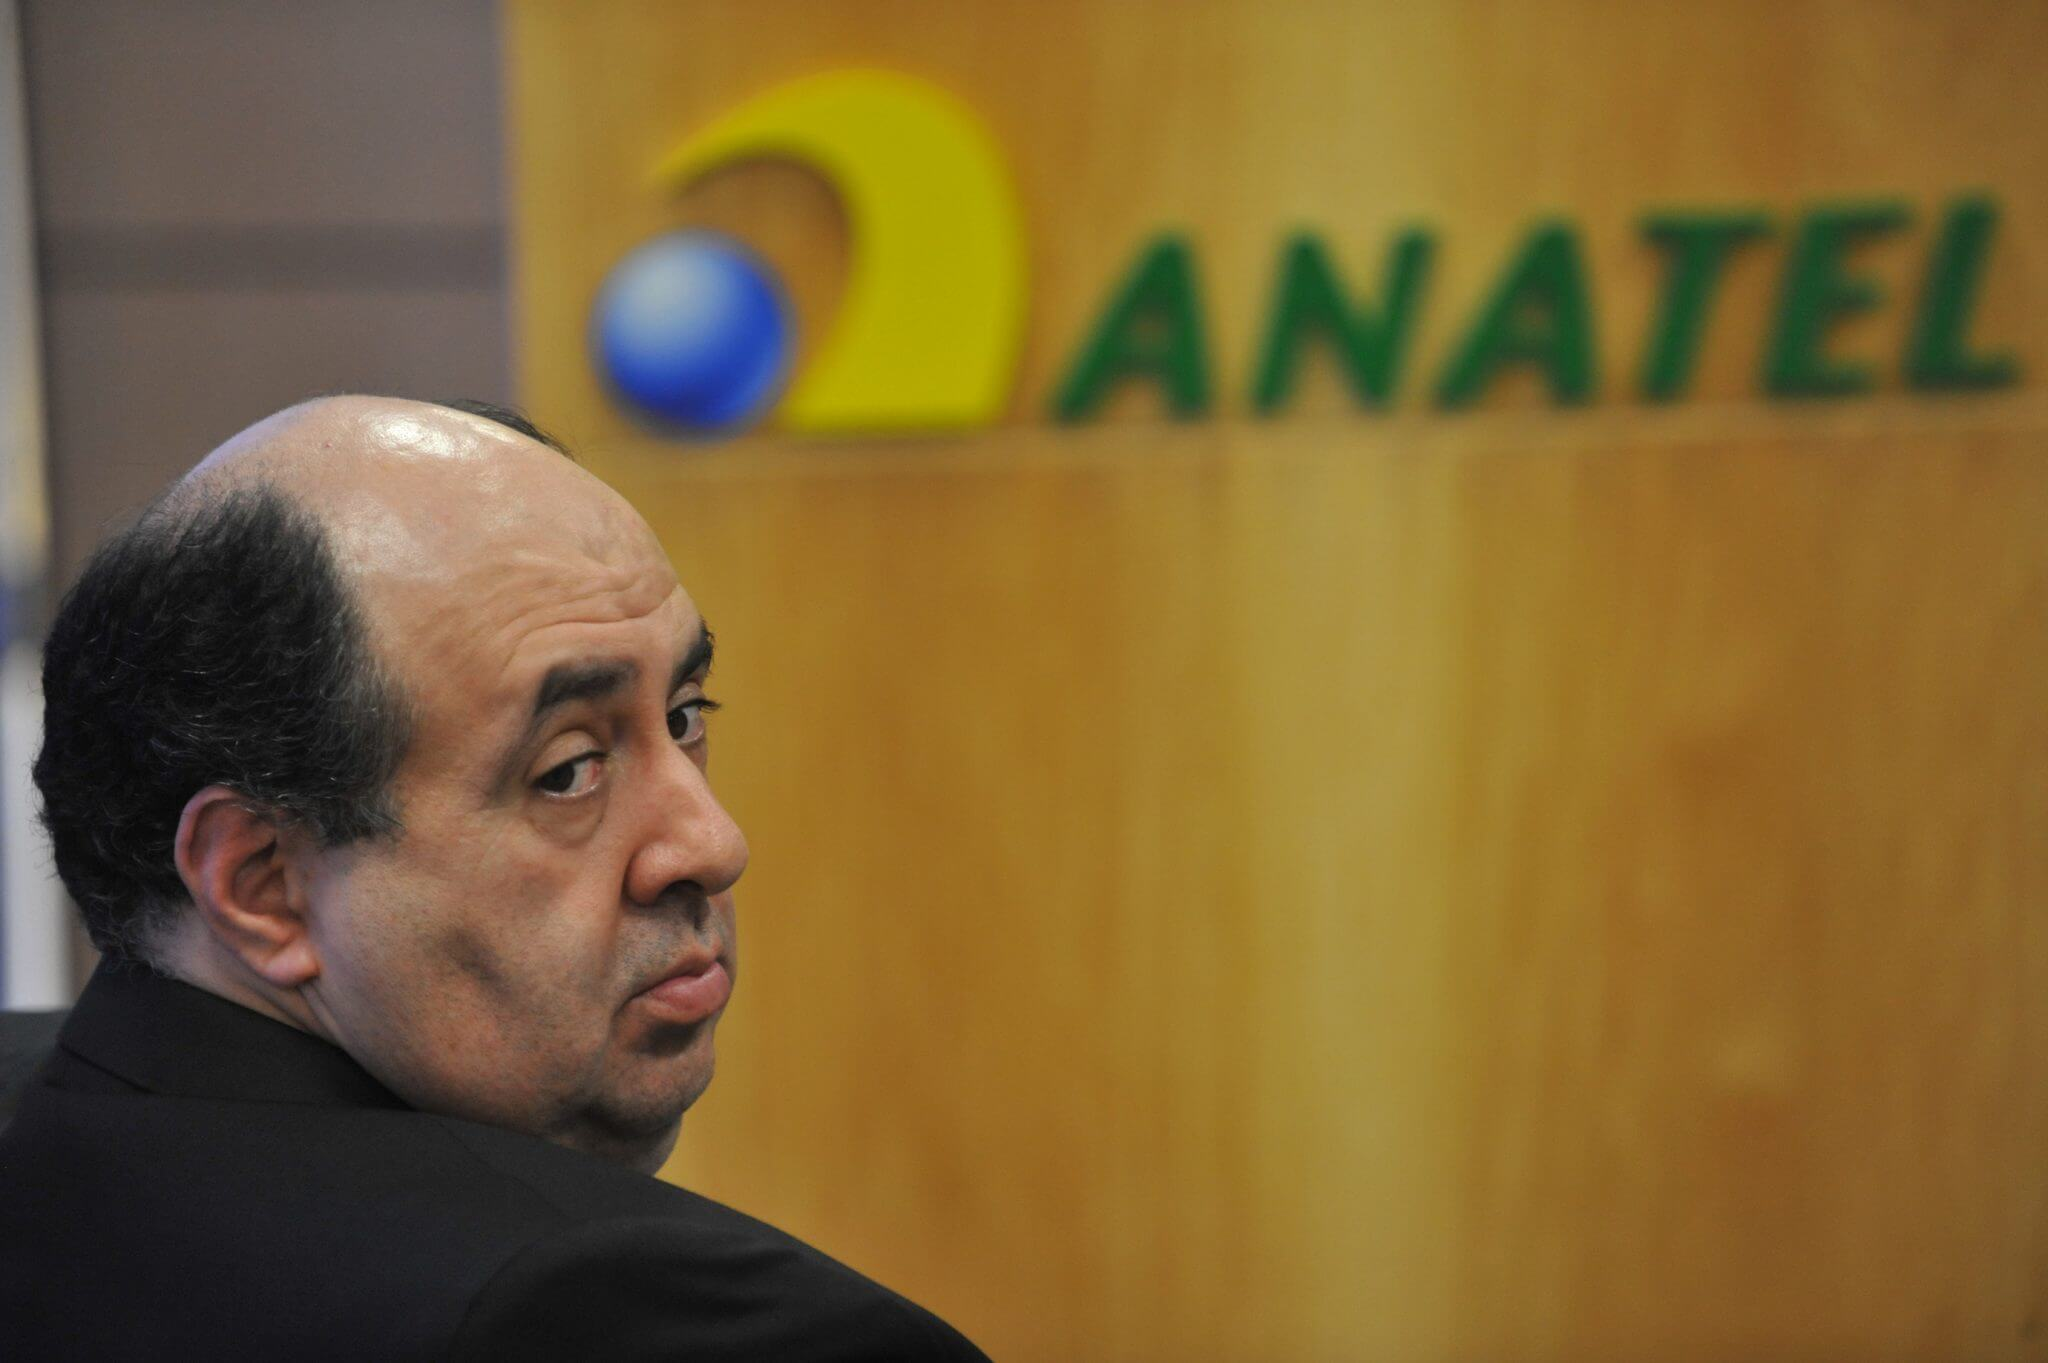 Tchau, querido: Presidente da Anatel renuncia ao cargo